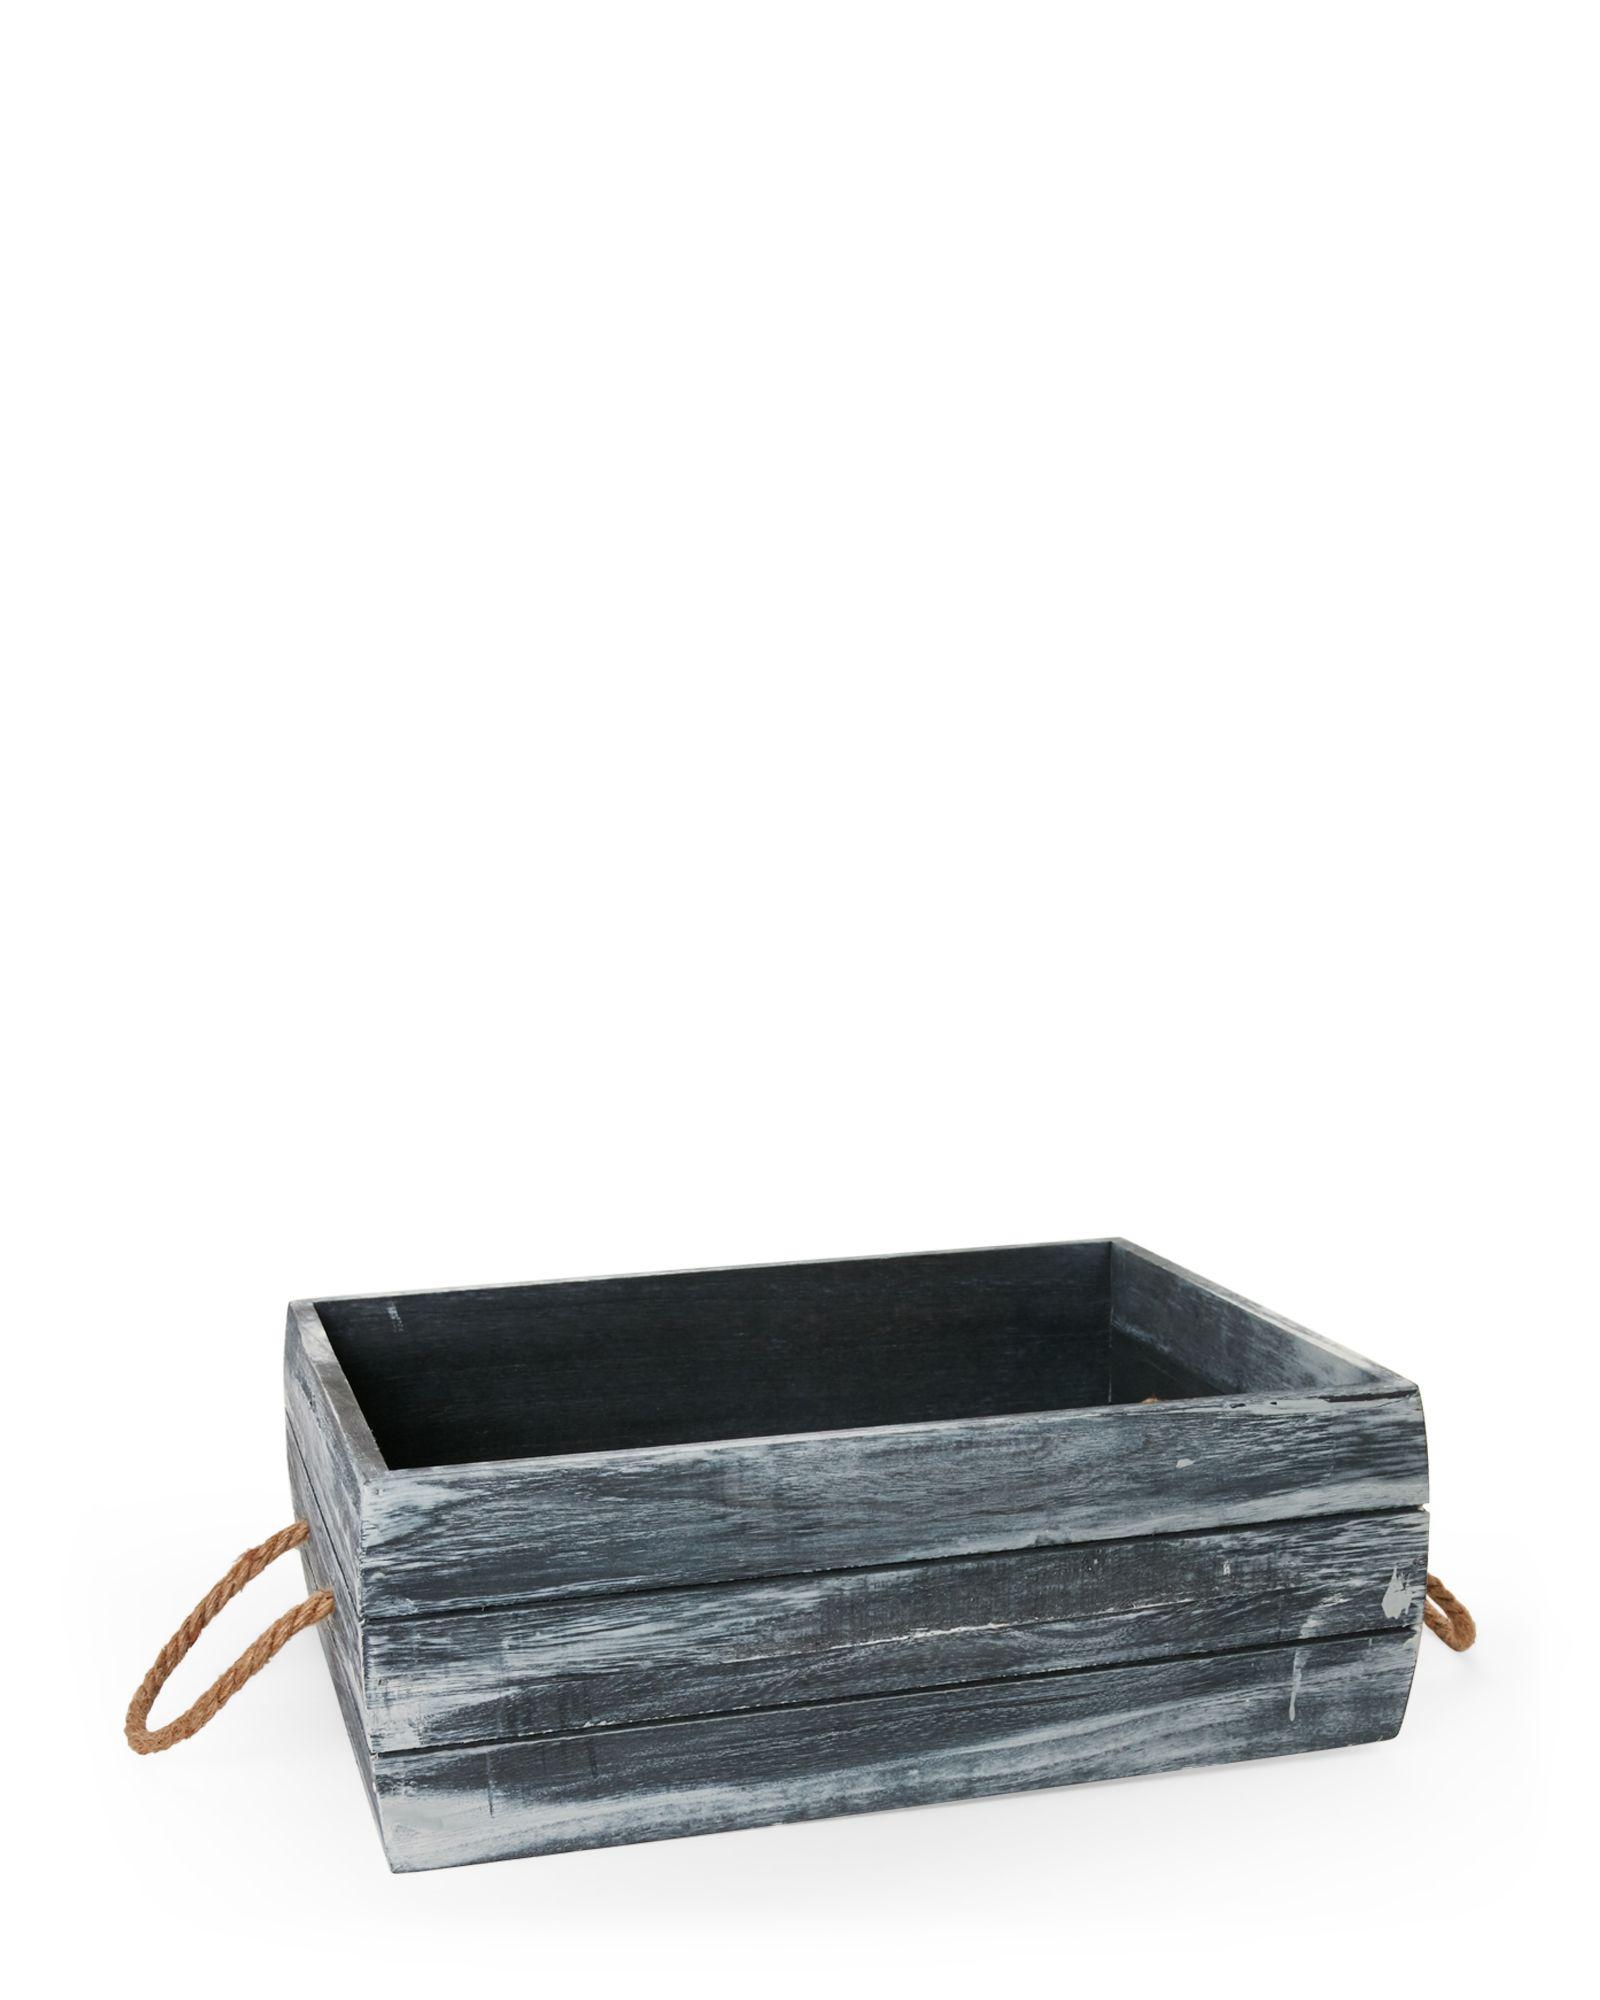 Storage Bin Medium Shallow Grey Crate